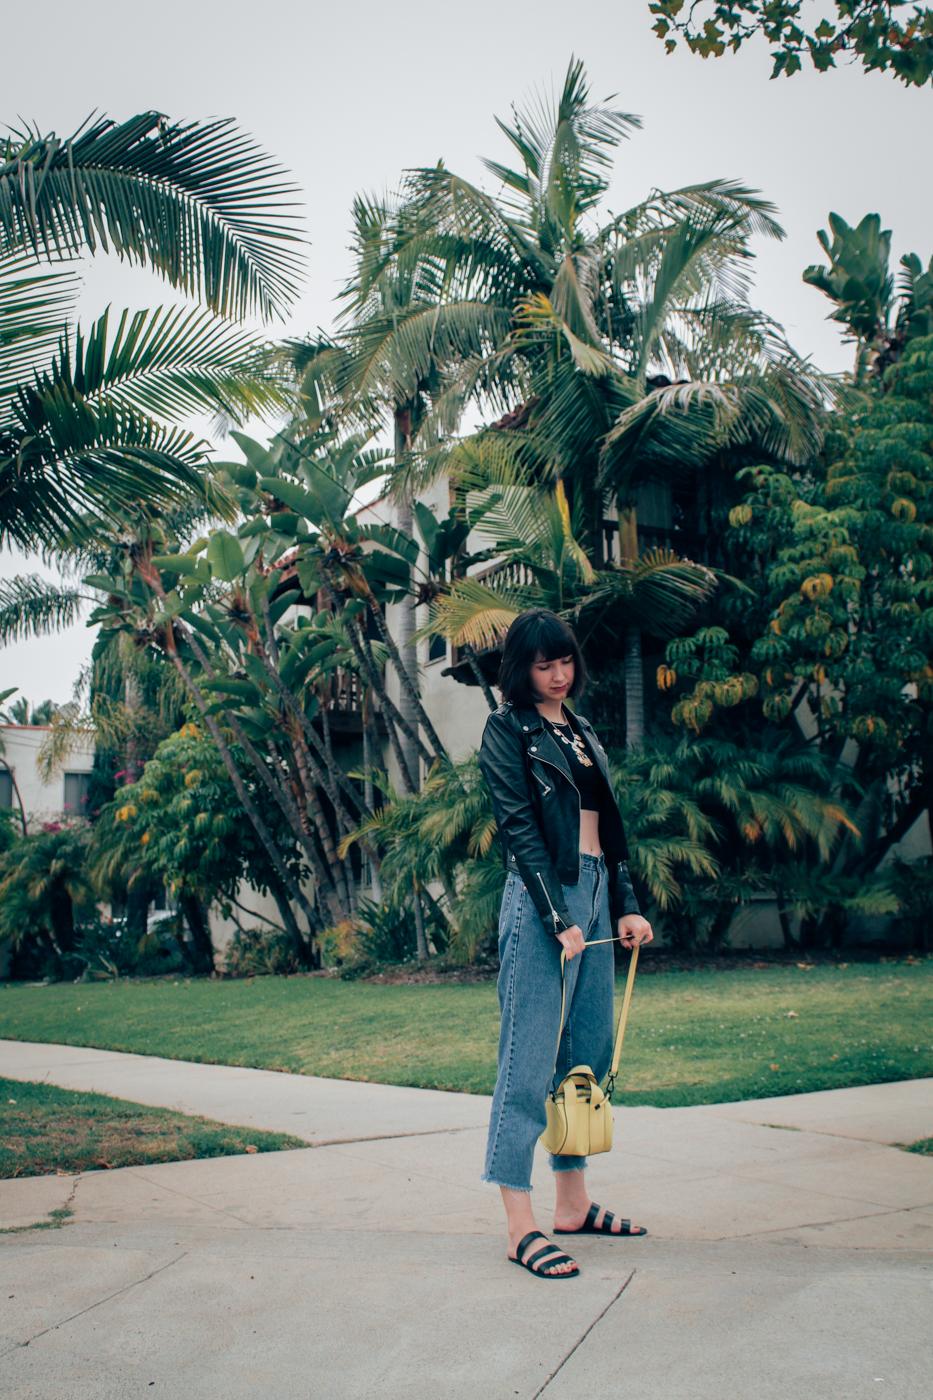 palmtrees-9